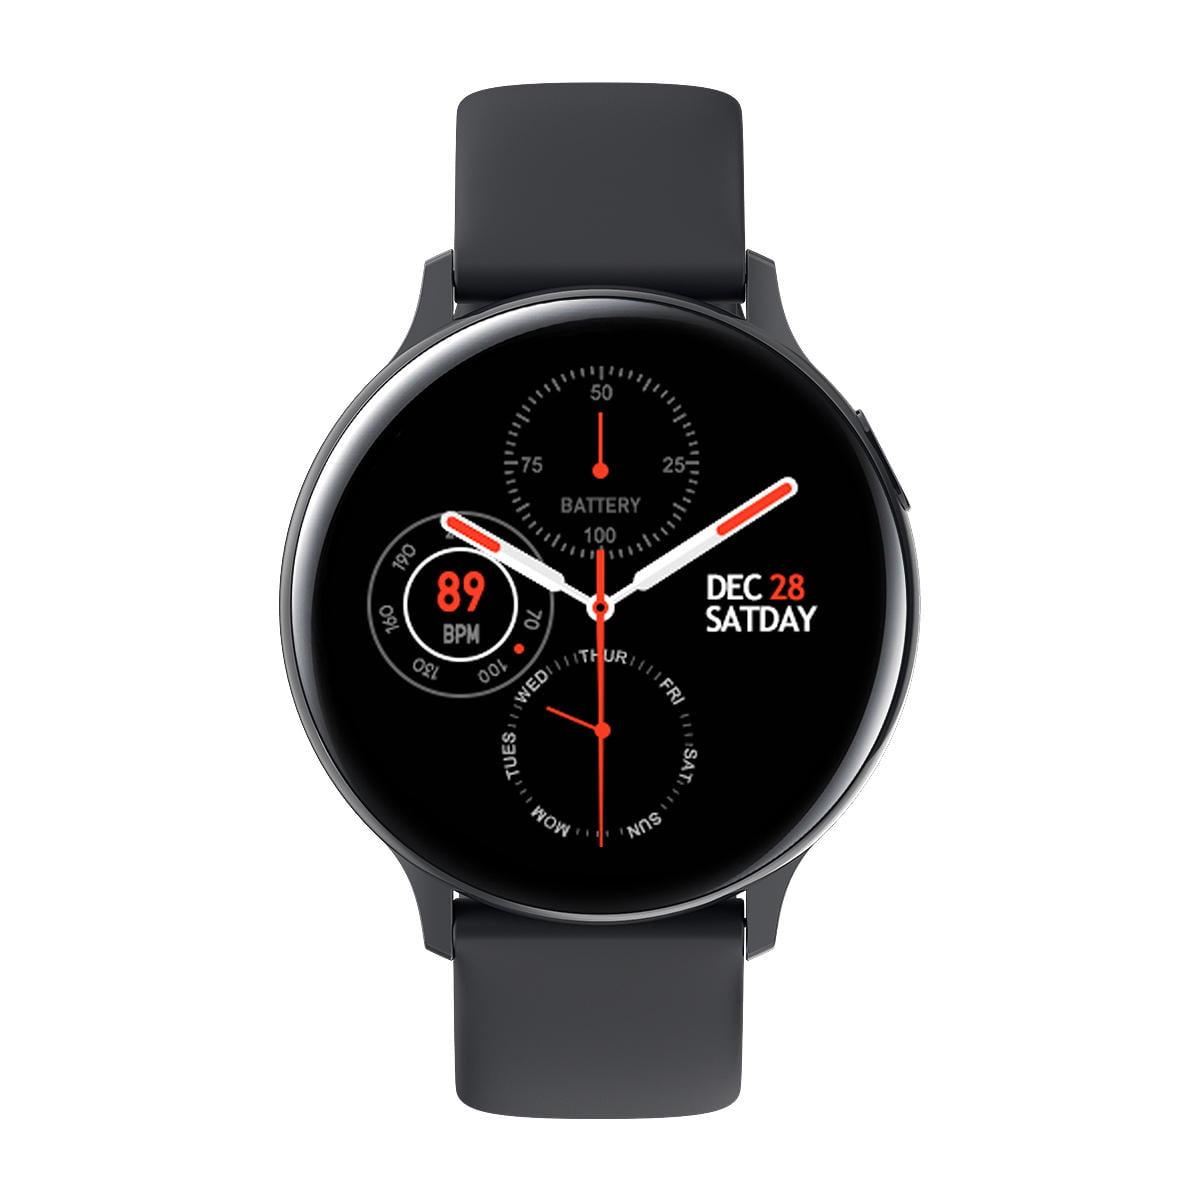 Bakeey smartwatch S20 ECG monitor smart watch heart rate monitor blood pressure (2)